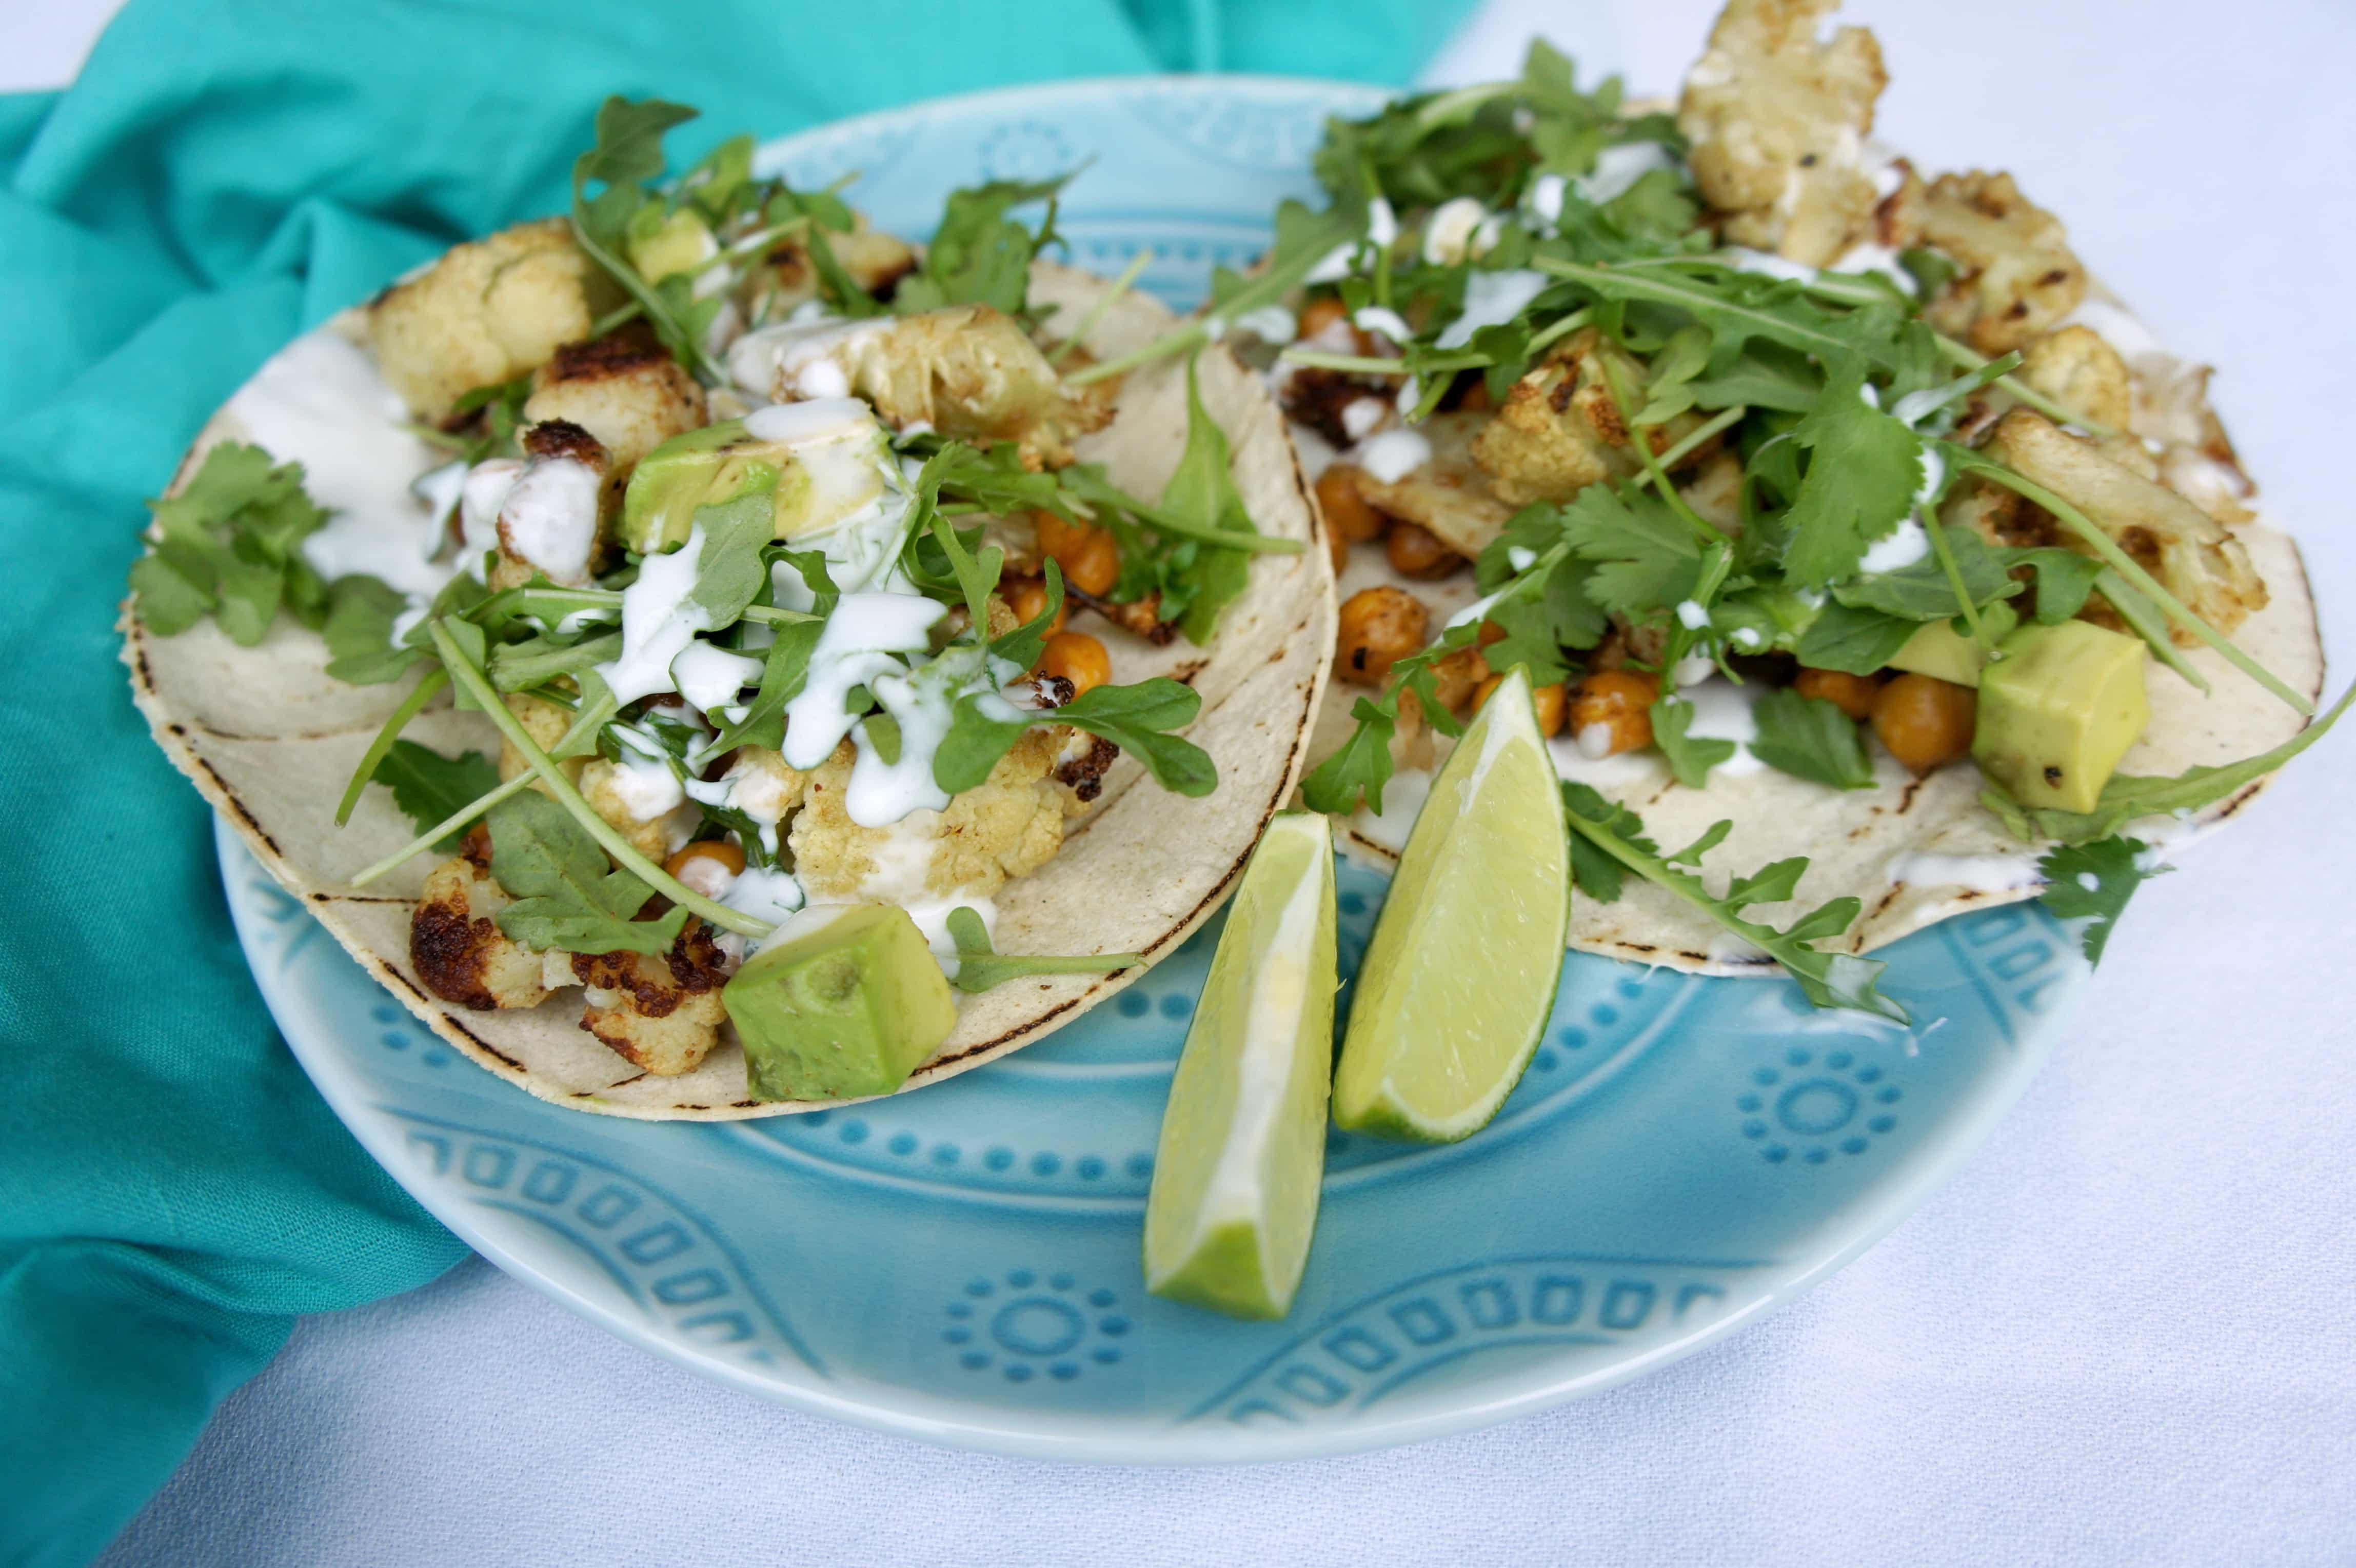 Cauliflower Chickpea Tacos